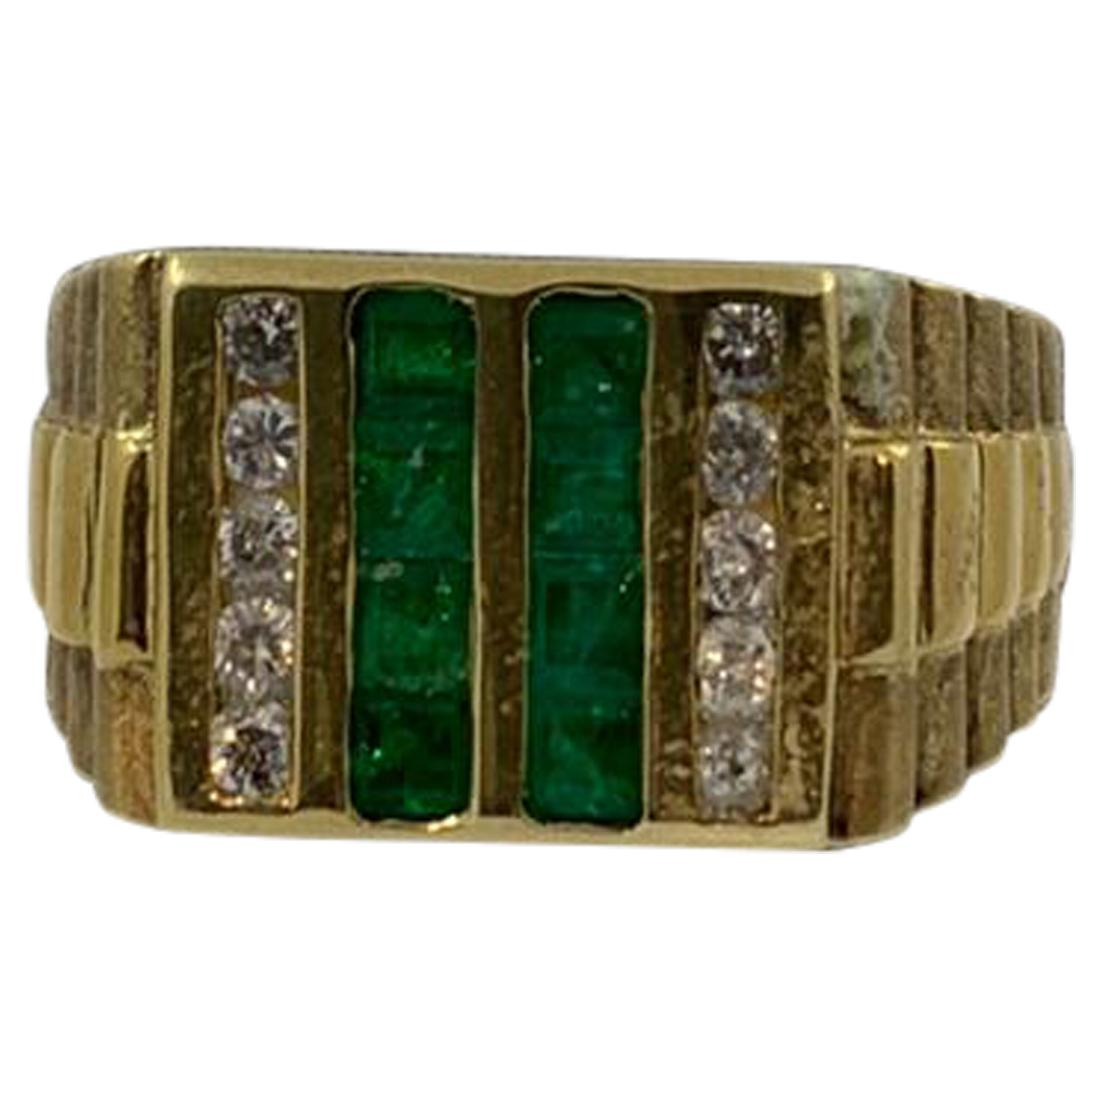 Emerald and Diamond Men's Ring